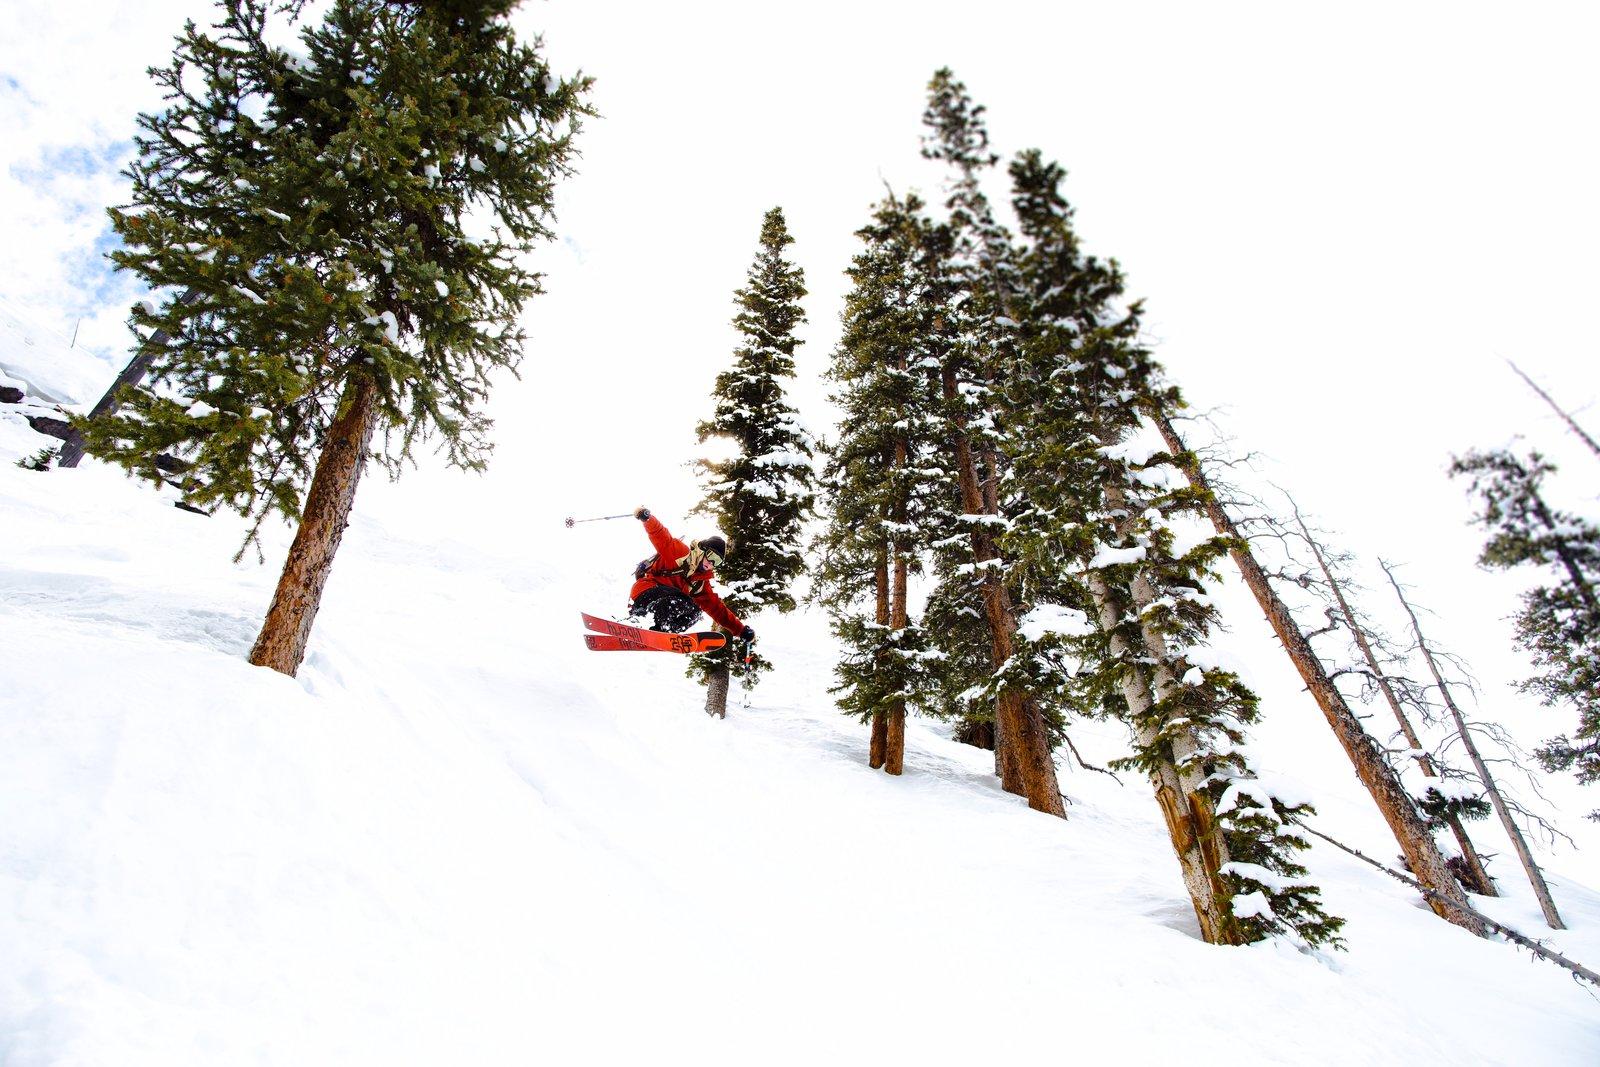 Winter hype